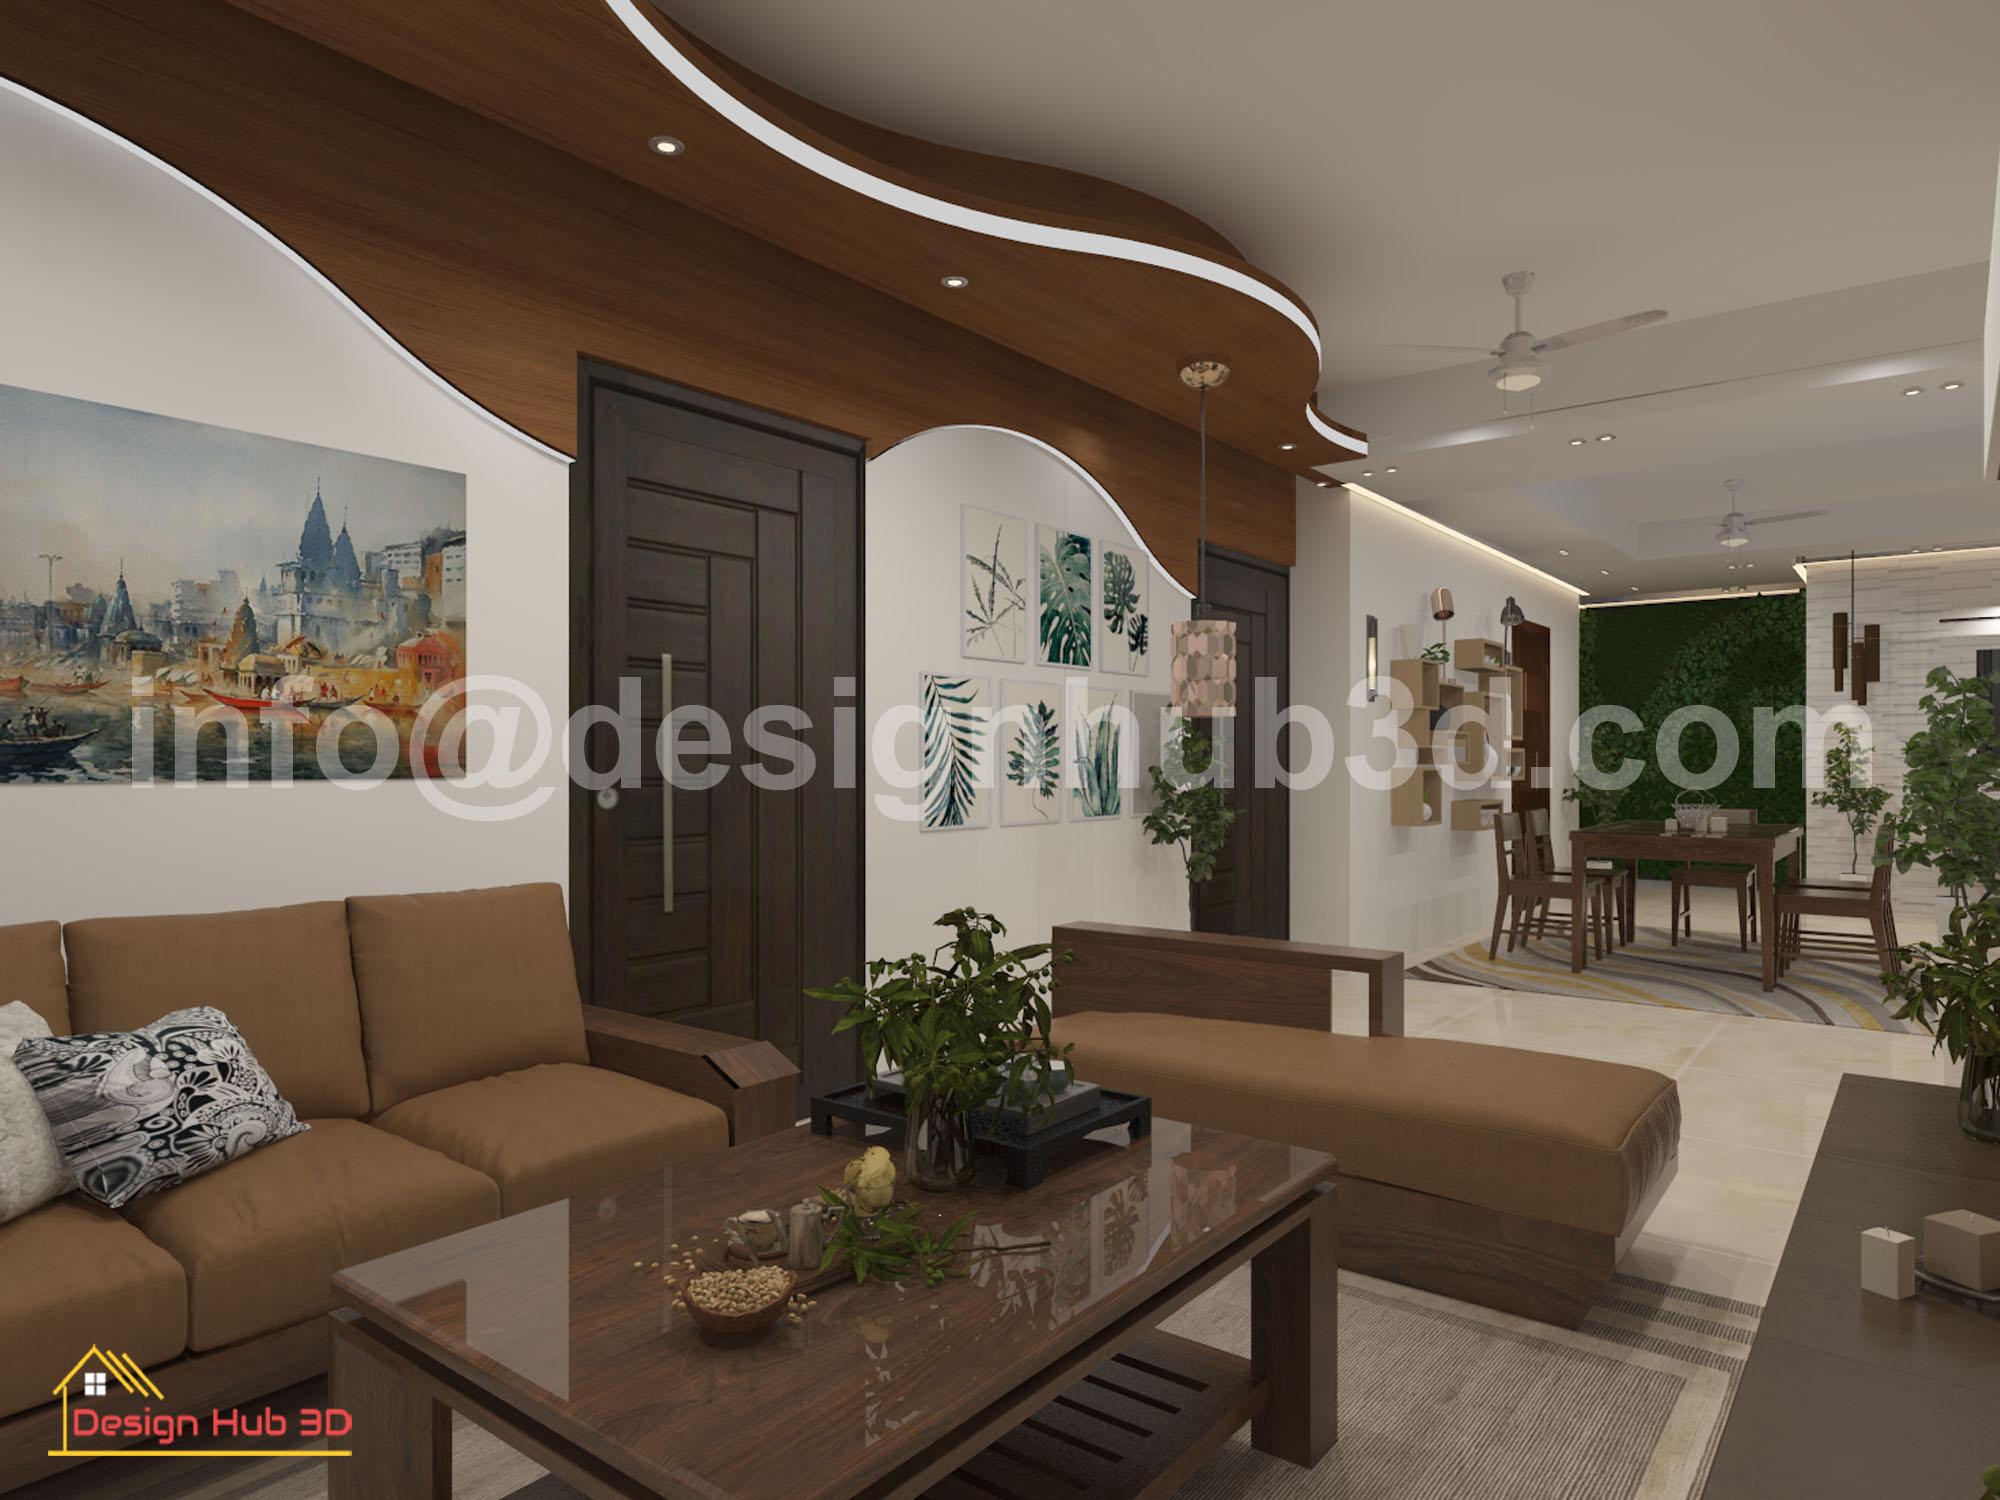 DesignHub 3D-Living Interior, Living Decor